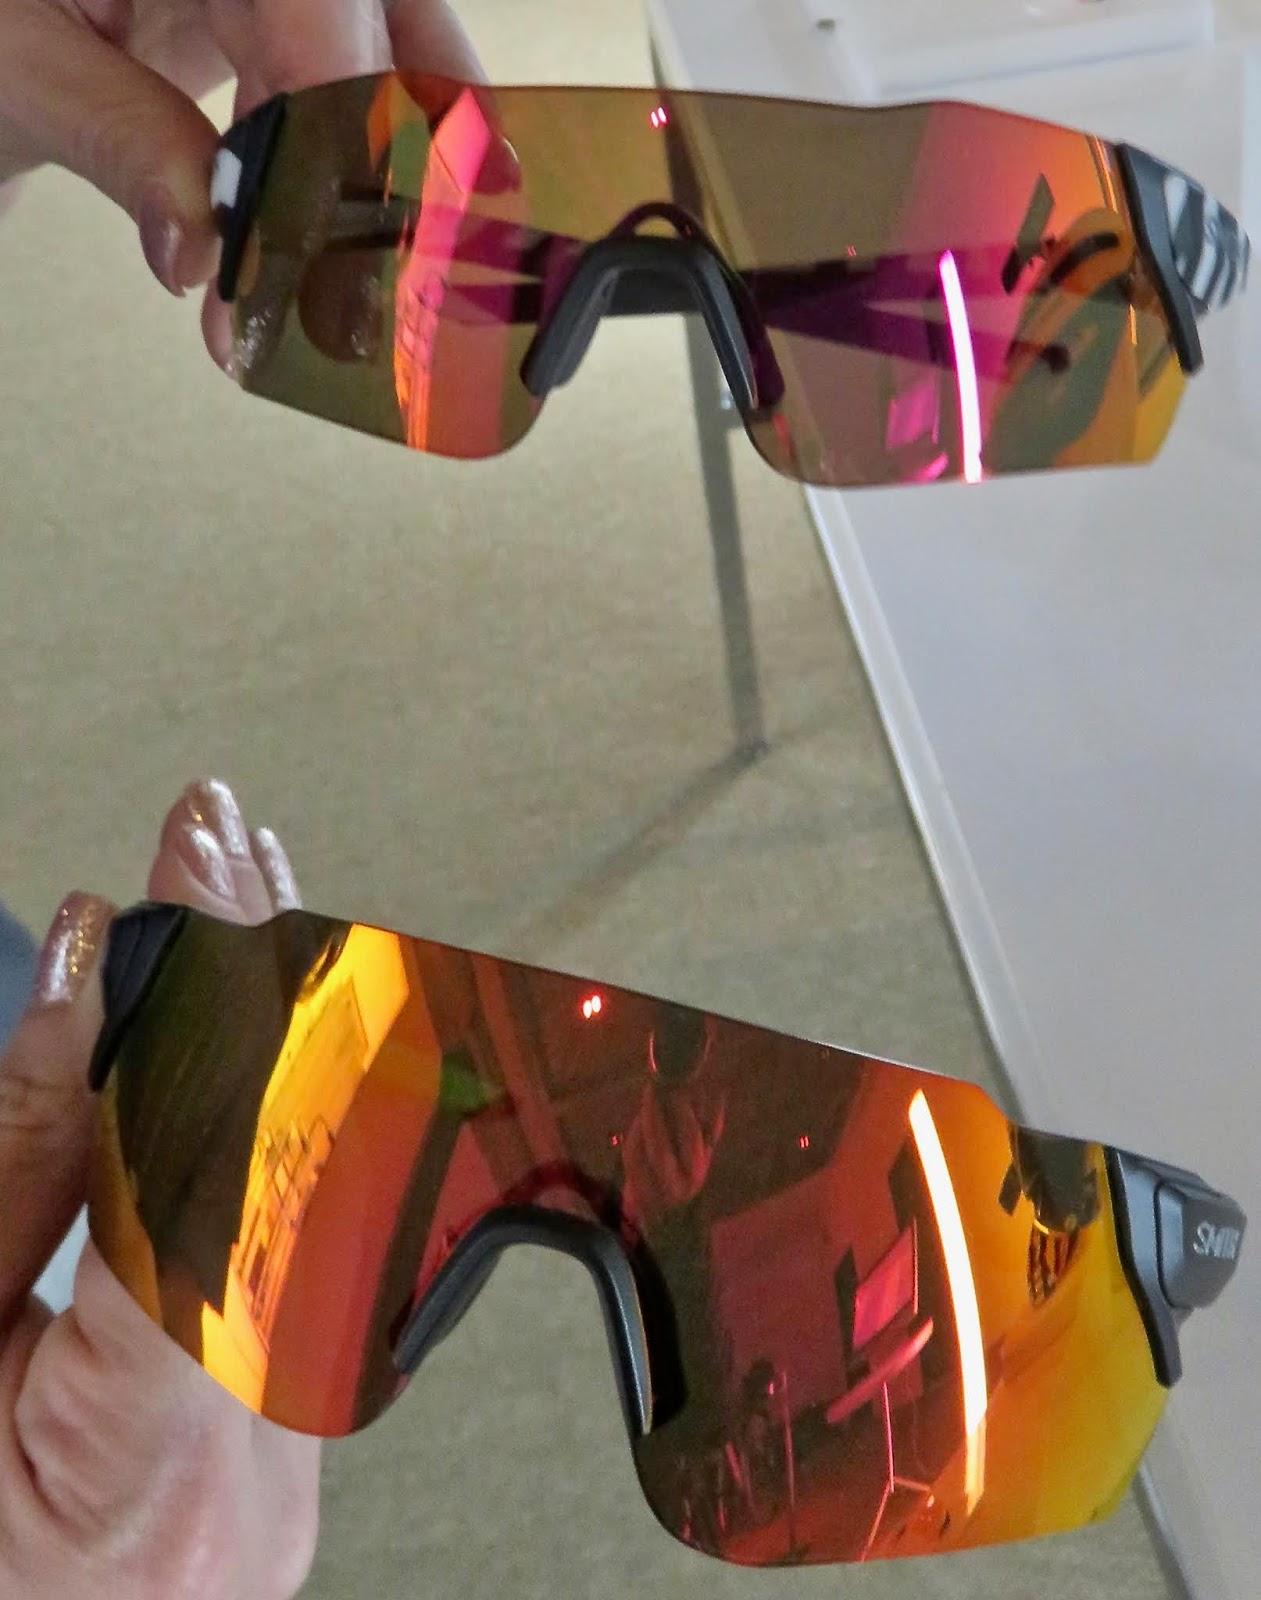 2f429a4e395f2 Smith Optics kinda retro-style-Attack + Attack Max ( 249 each) feature  ChromaPop color enhancing lens technology